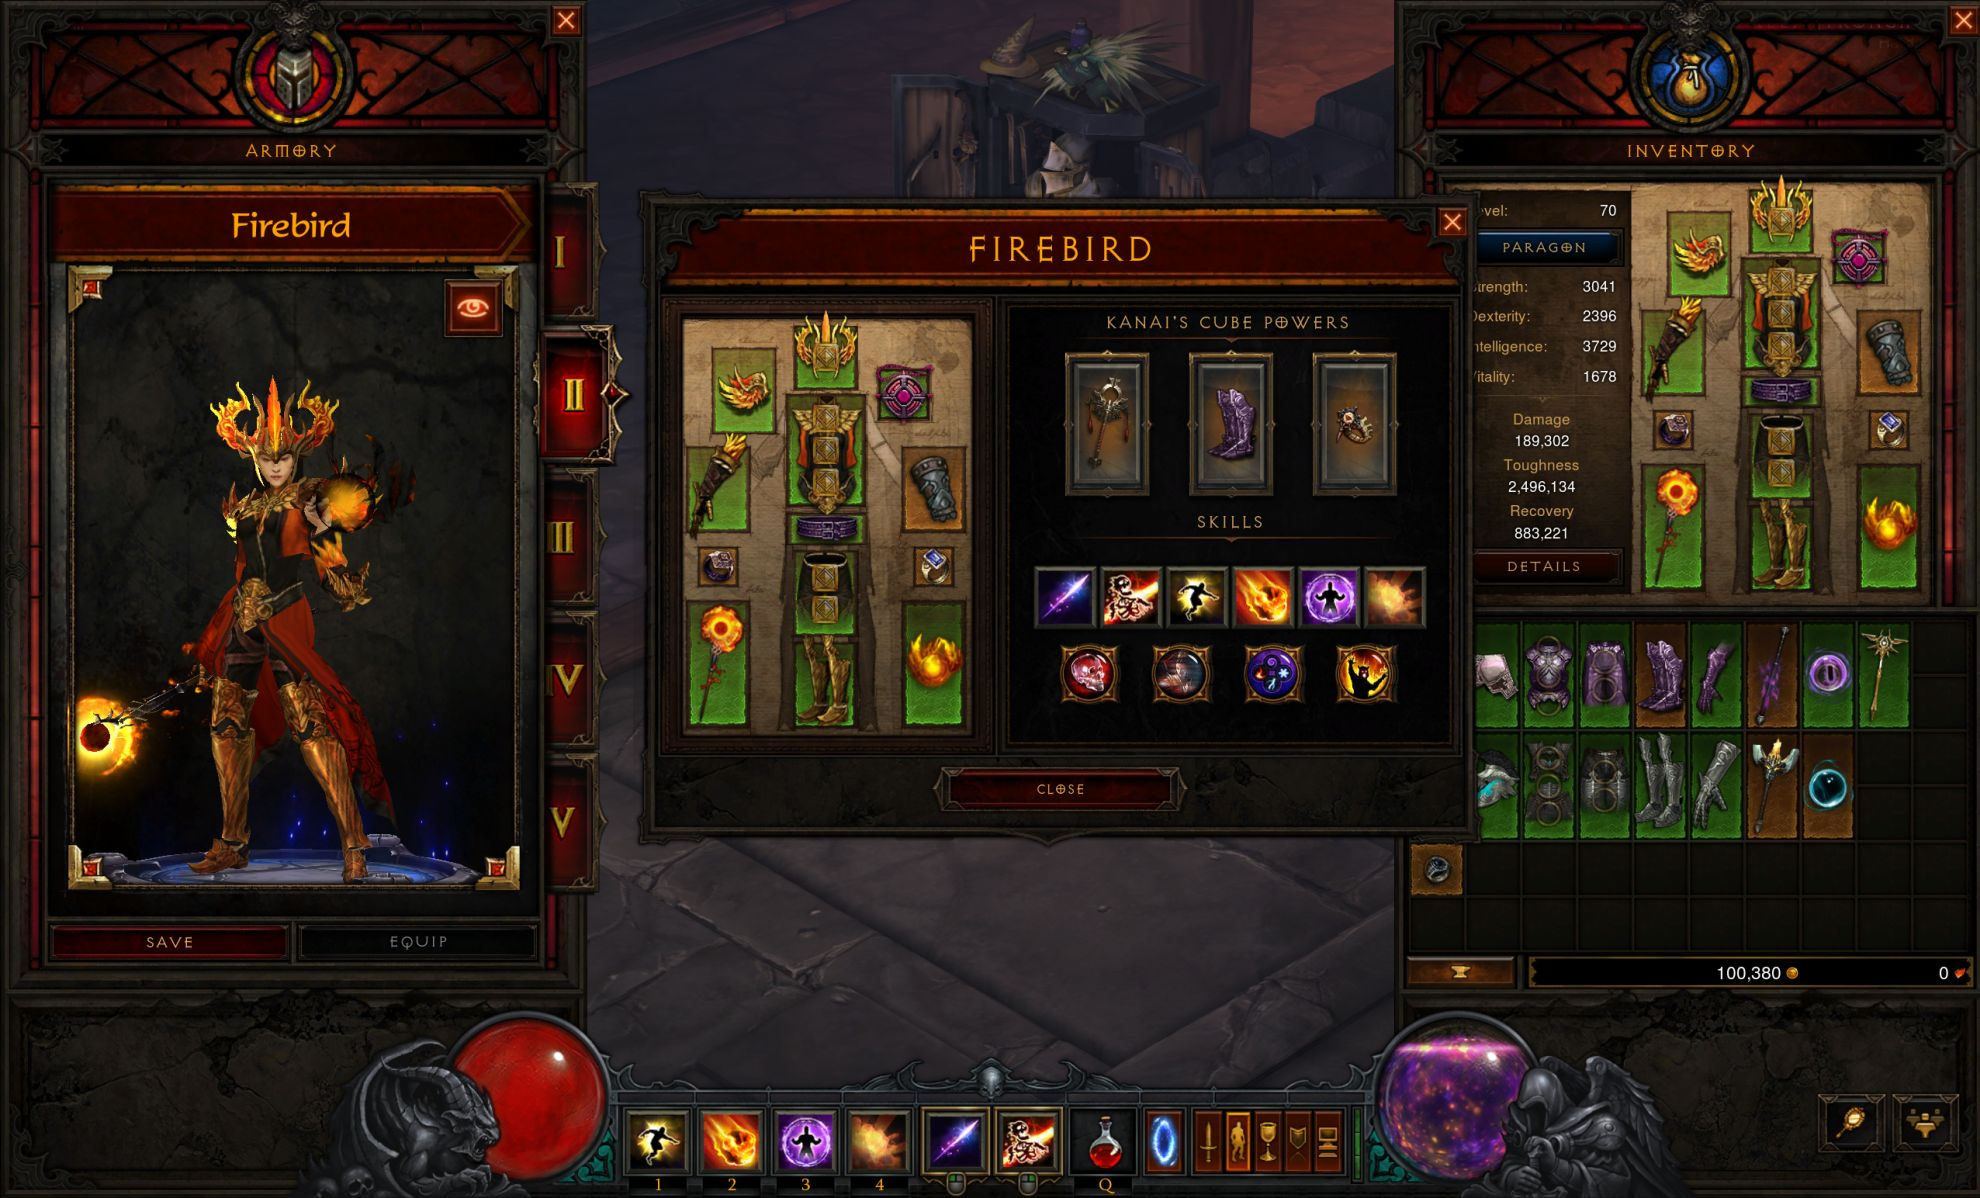 Diablo 3's new Armory will let you swap gear, skills, gems